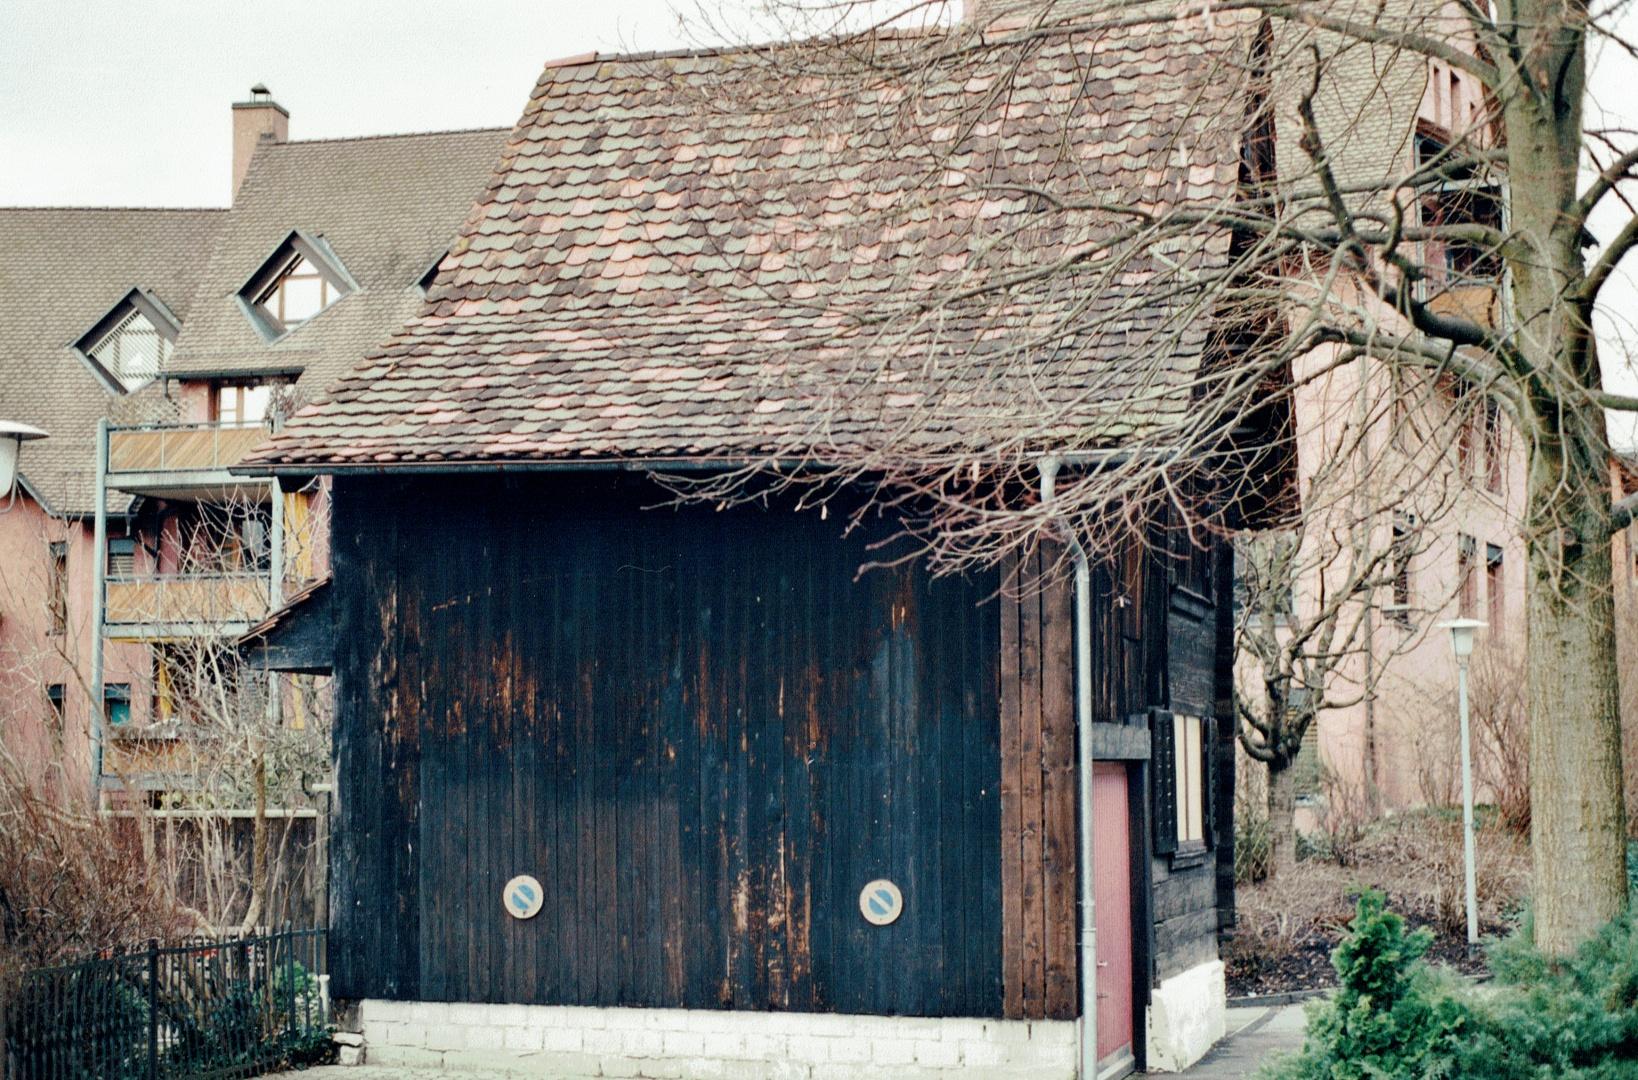 © Urs Koller, Bärengasse 3, 6317 Oberwil